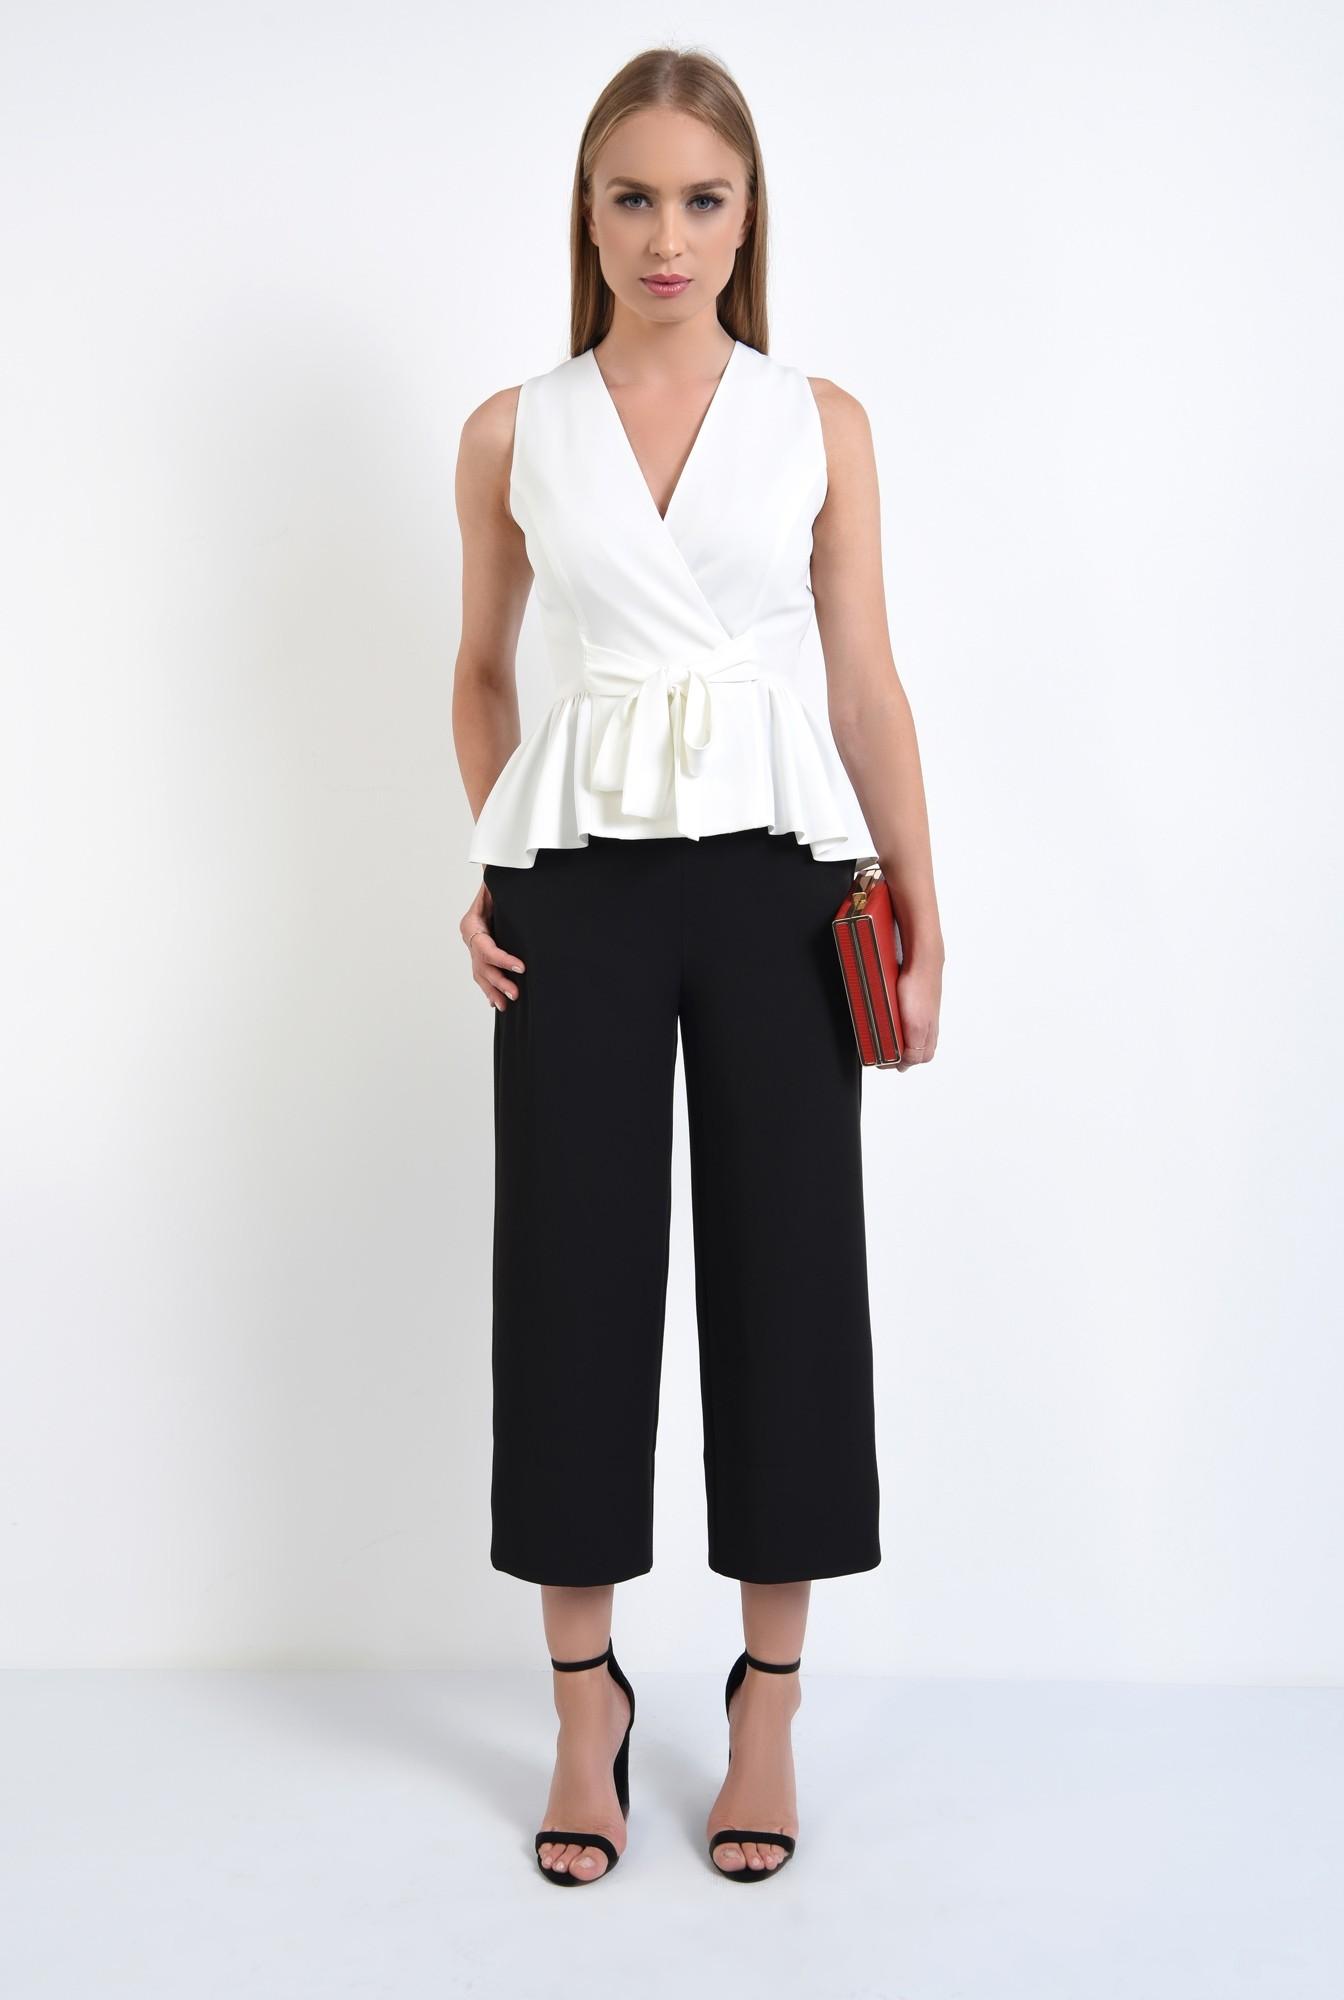 0 - 360 - pantaloni eleganti drepti, wide leg, buzunare functionale